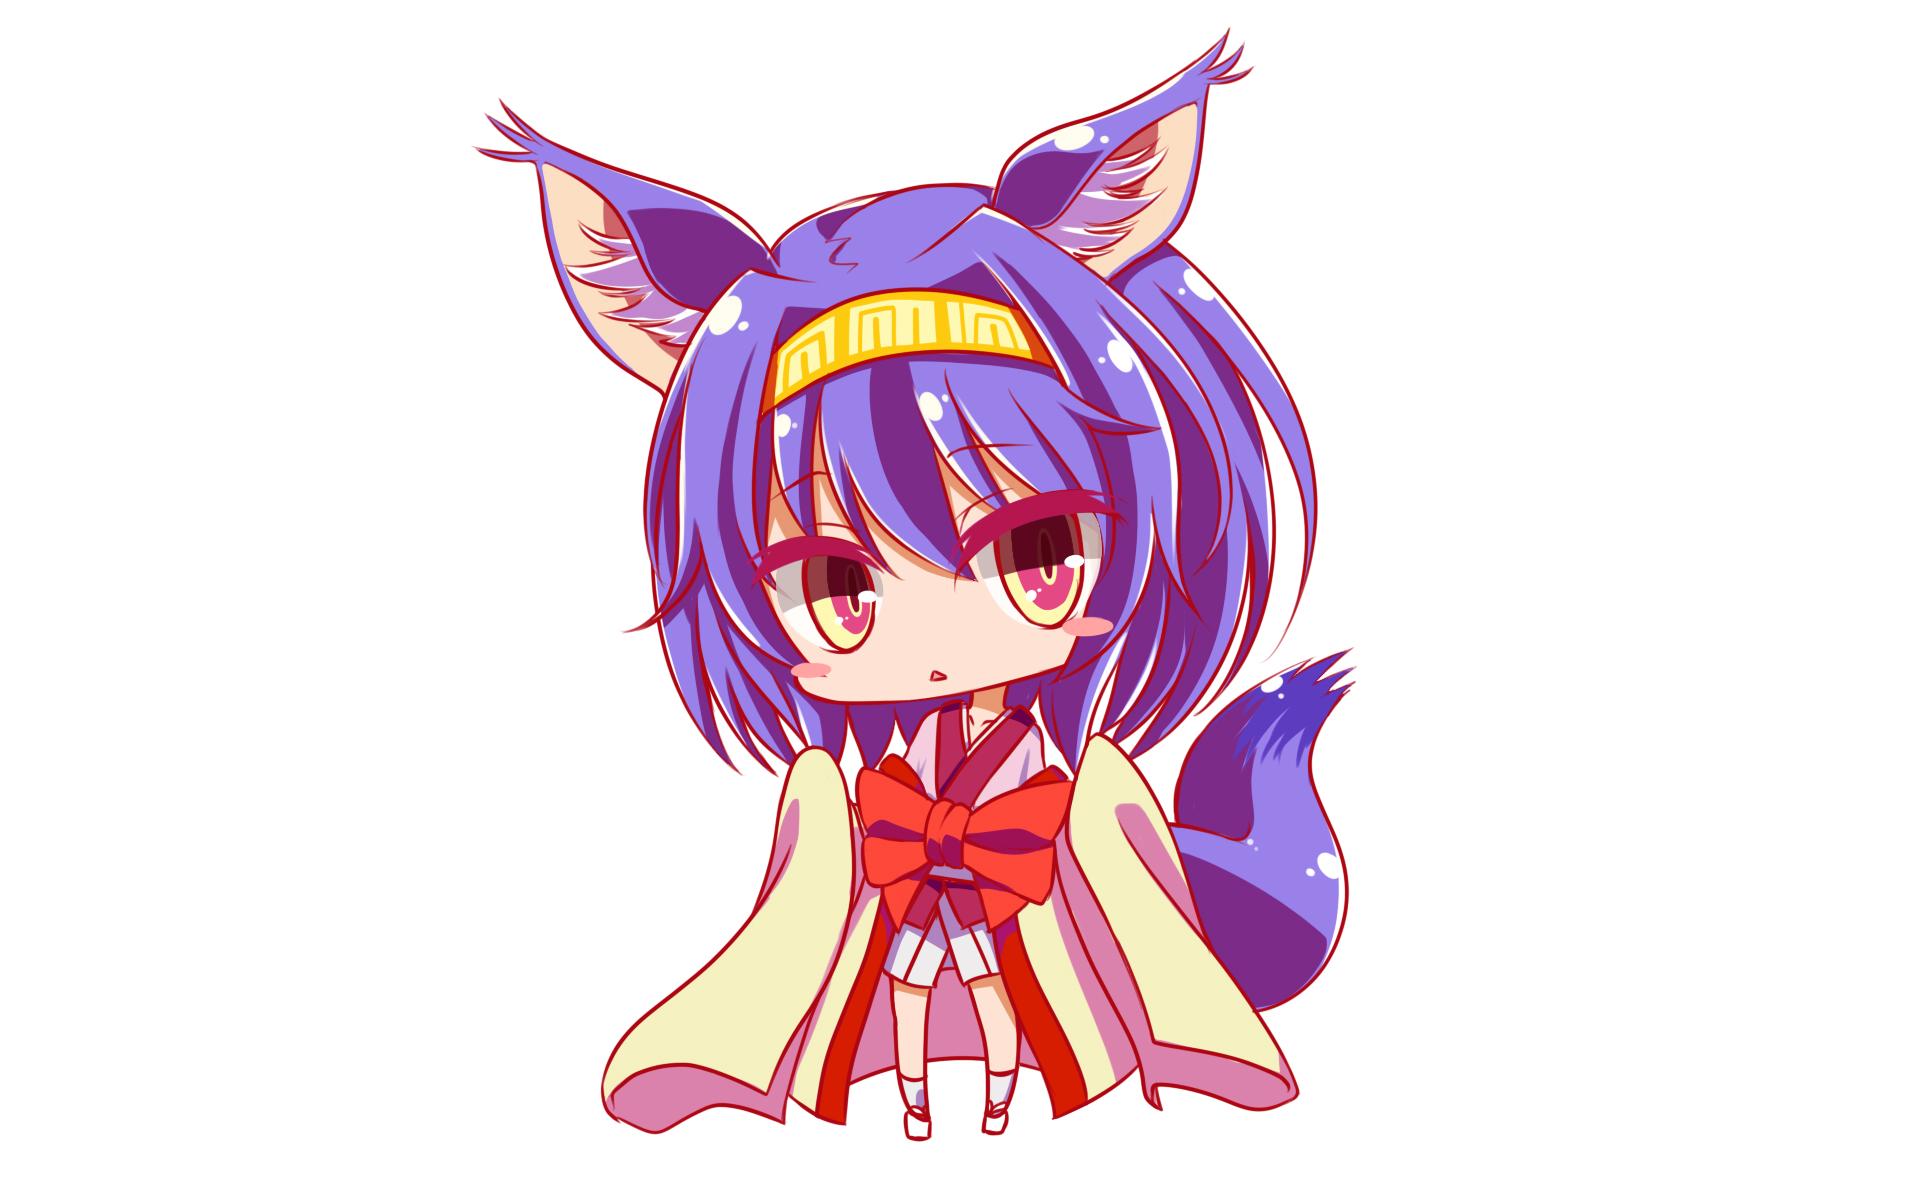 Papel Pintado De Izuna Hatsuse De Anime No Game No Life No Game No Life Character Design Cat Girl